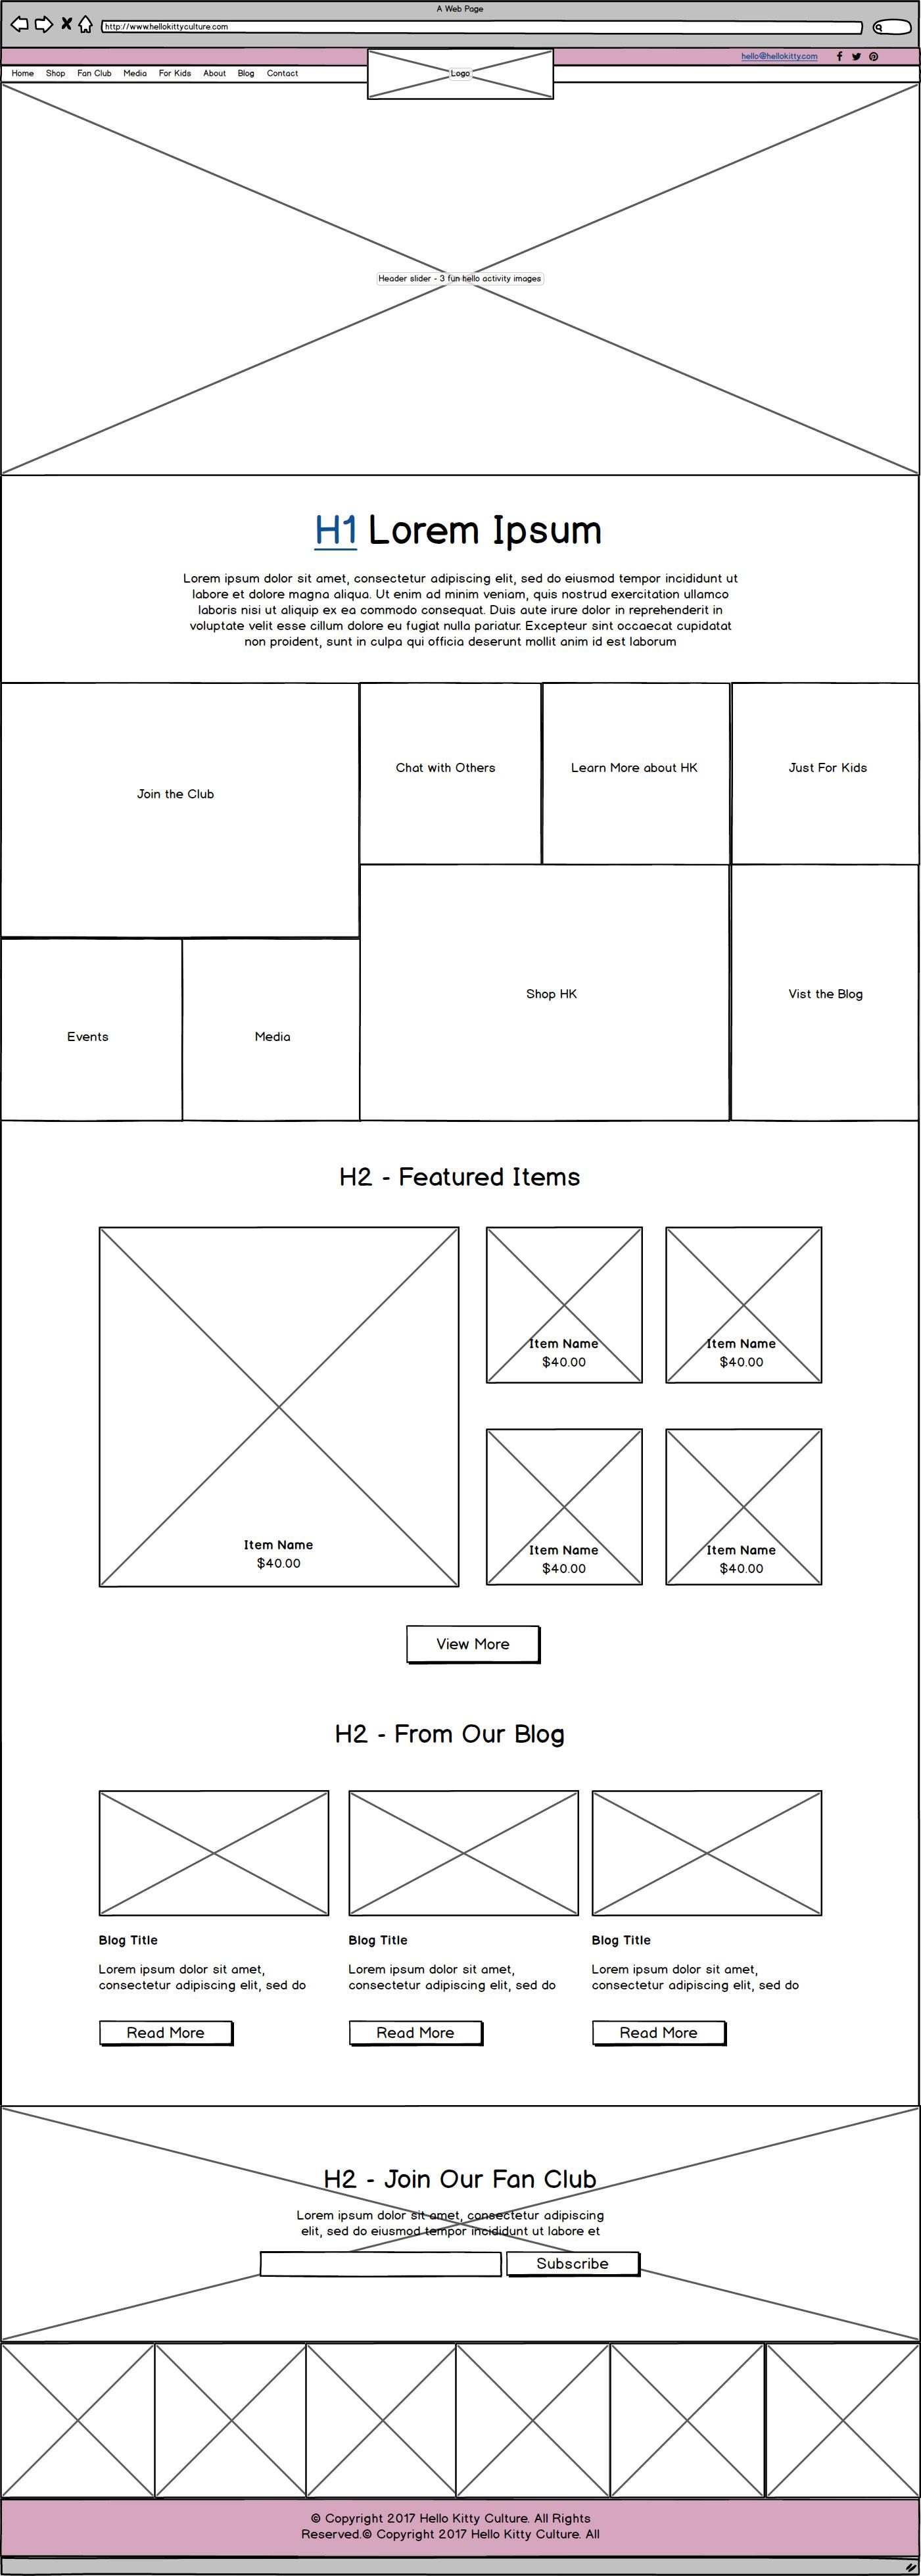 HK Culture Fan website design home page wireframe